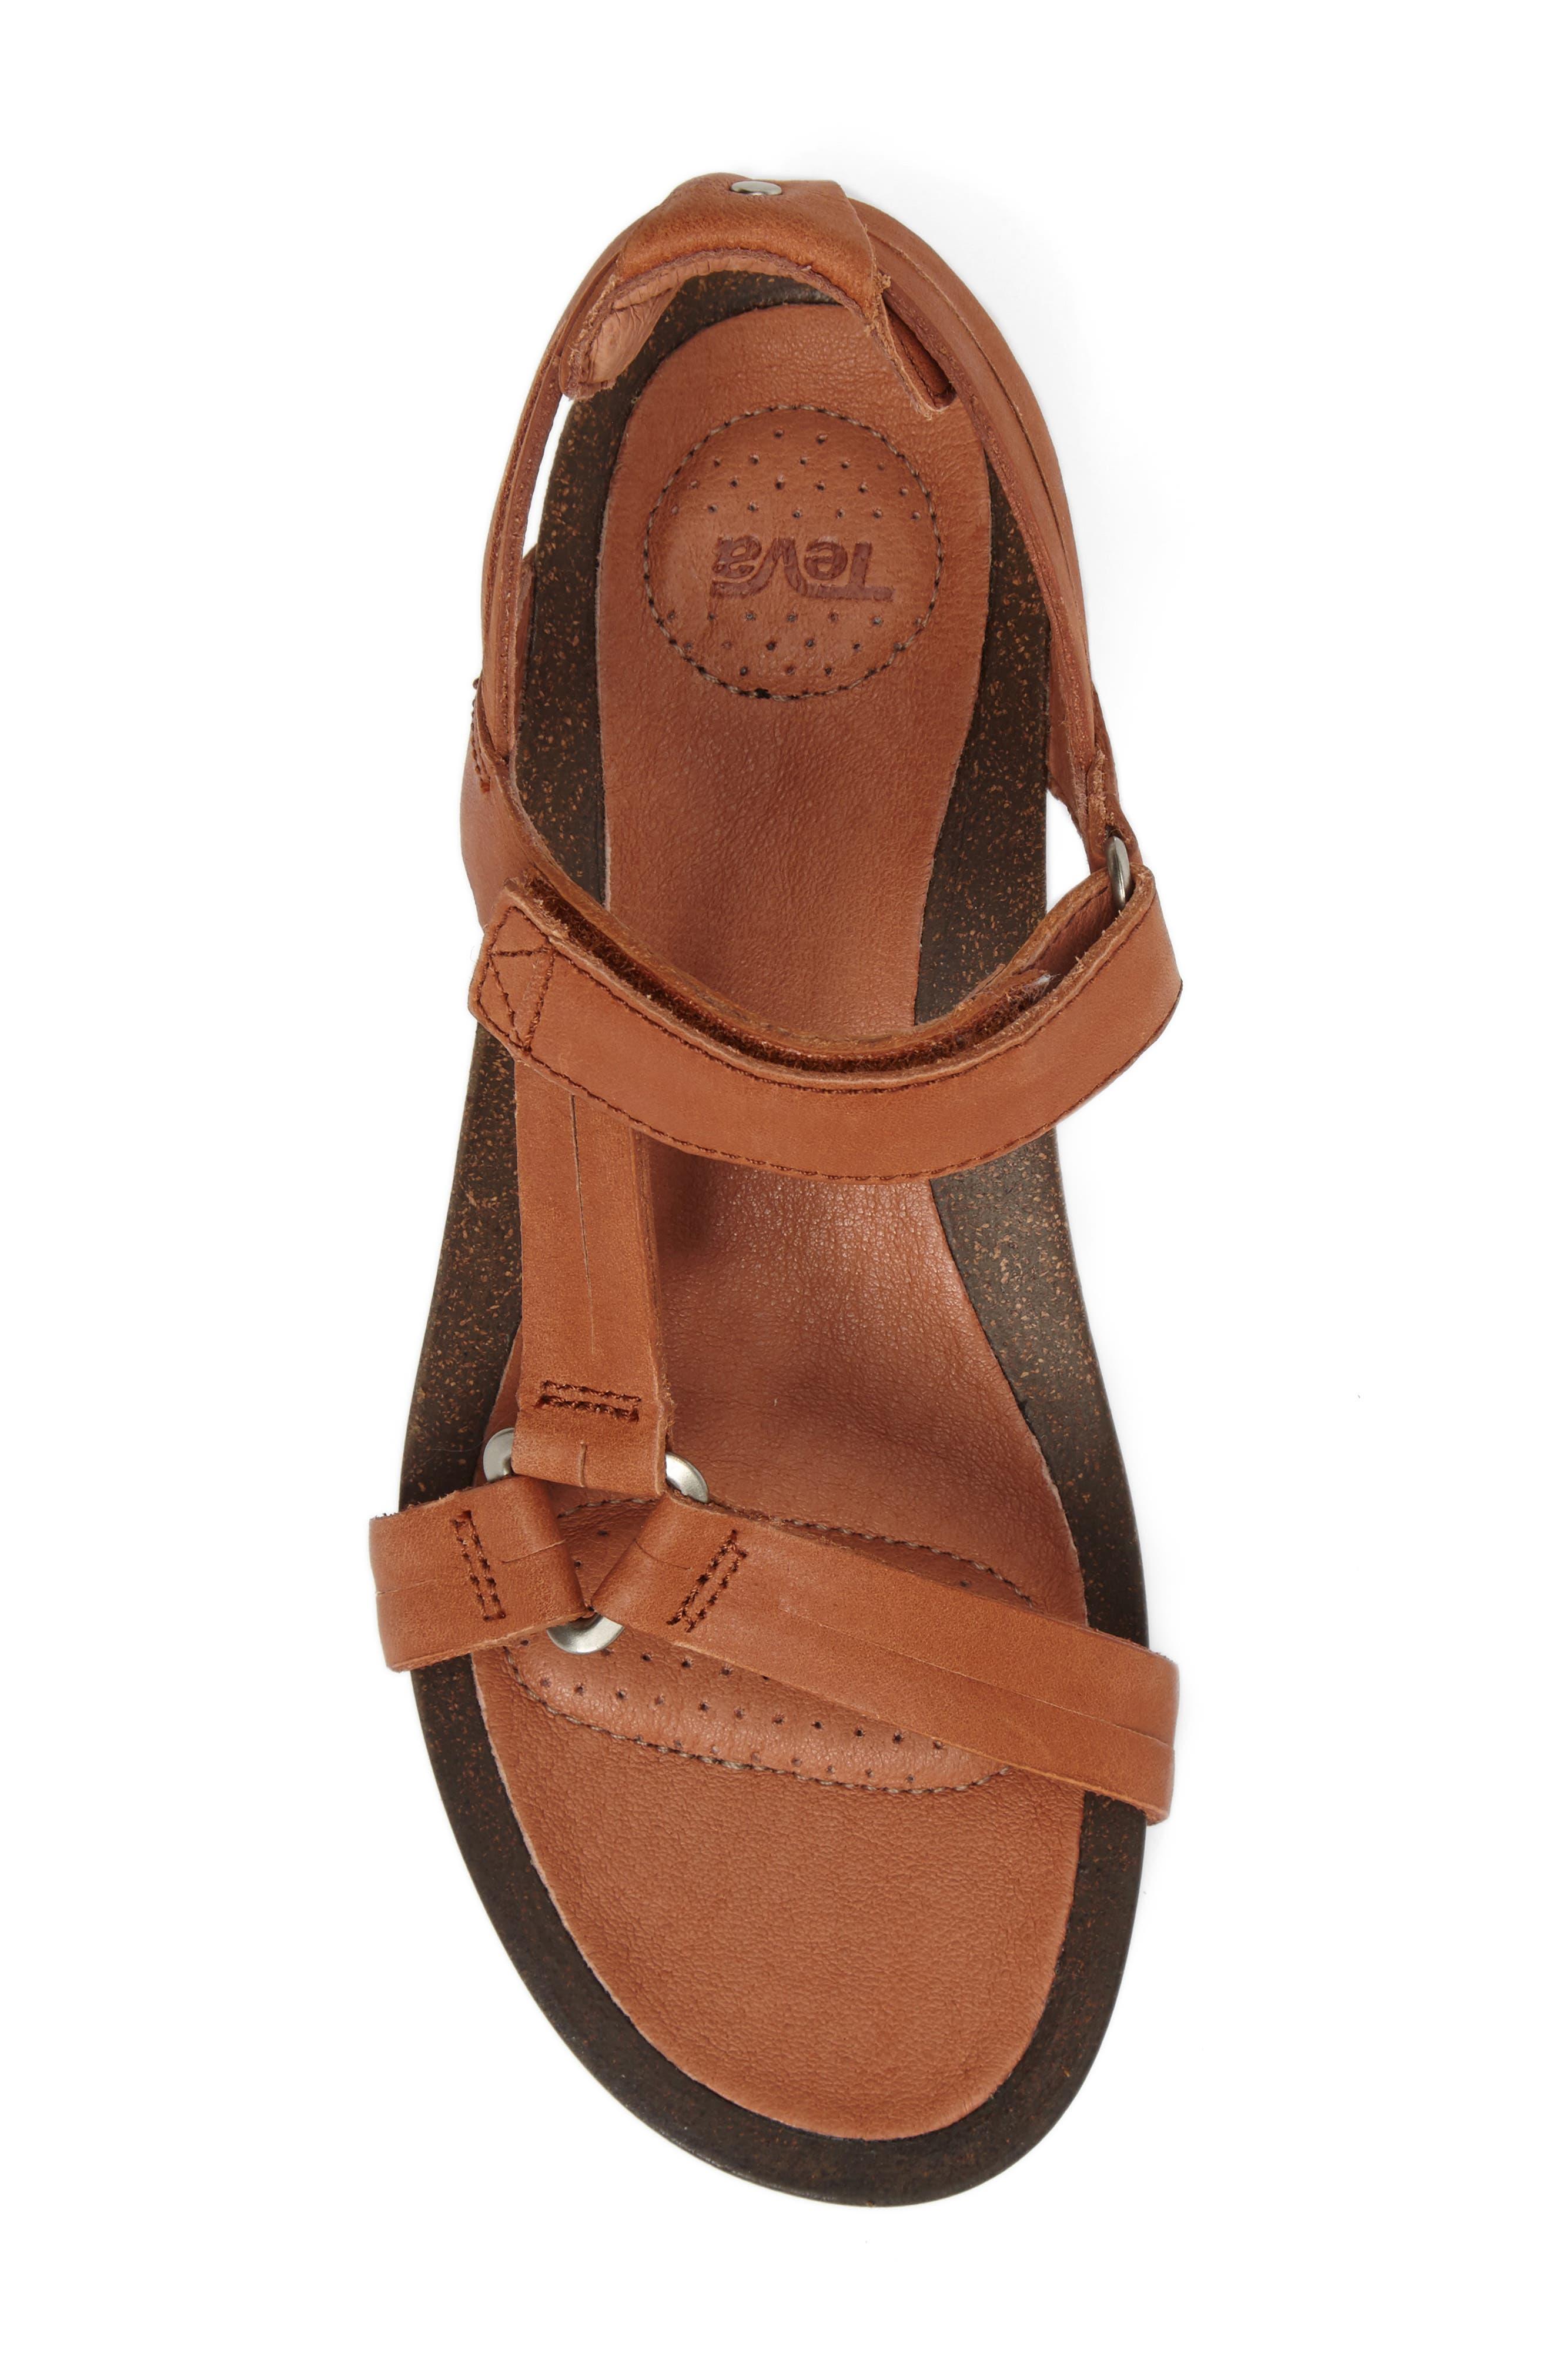 Ysidro Universal Sandal,                             Alternate thumbnail 4, color,                             Cognac Leather